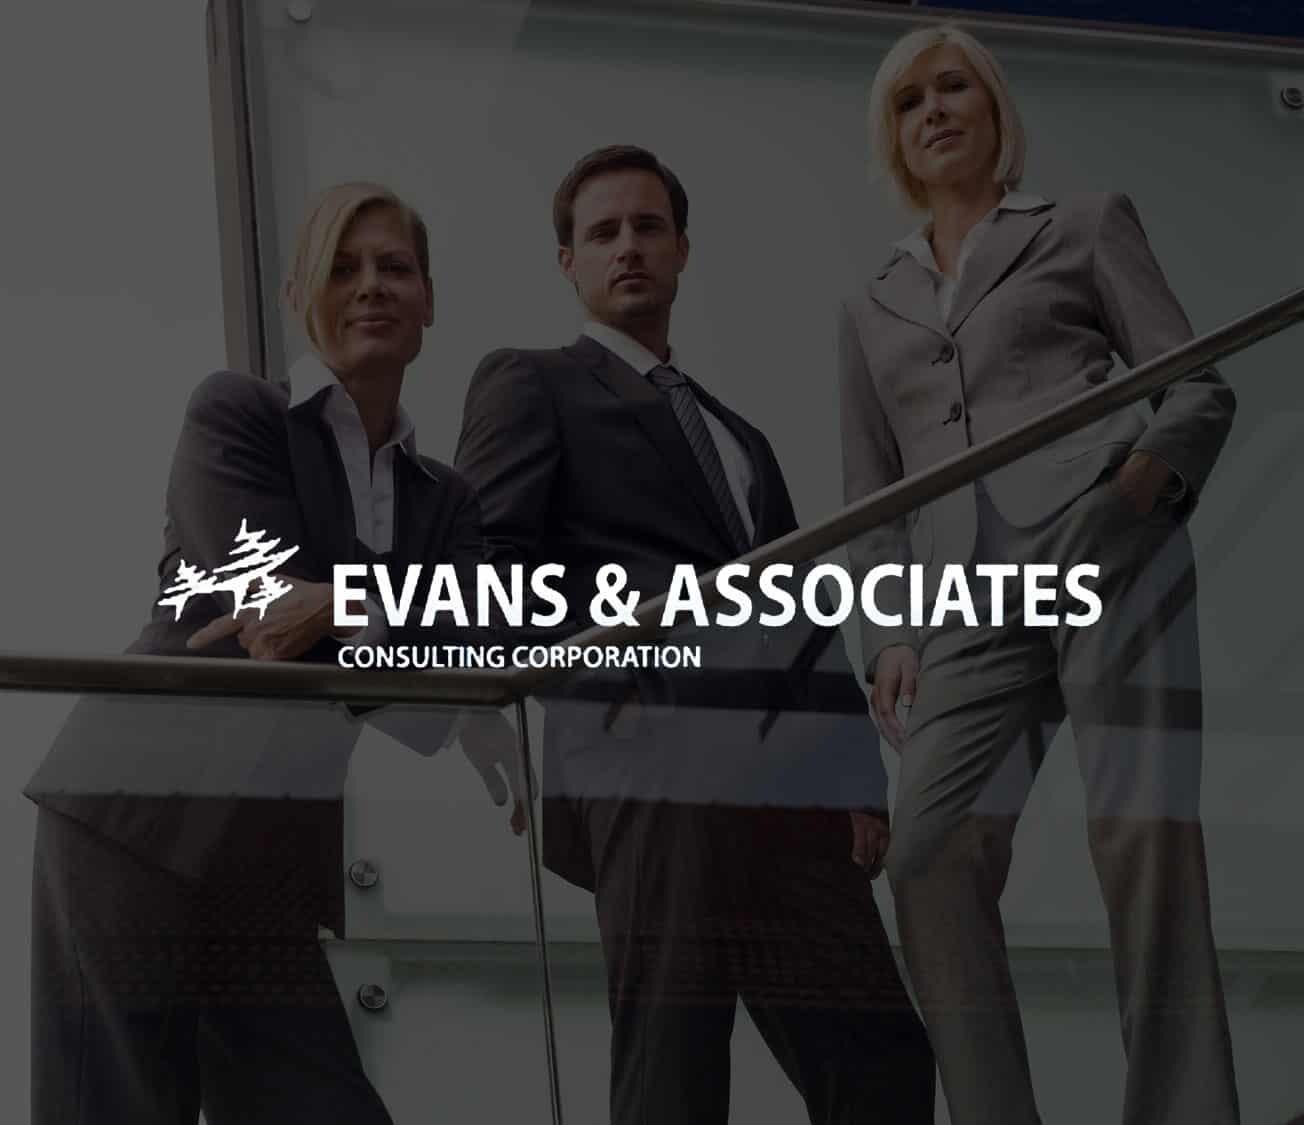 Professional corporation web design Syracuse NY